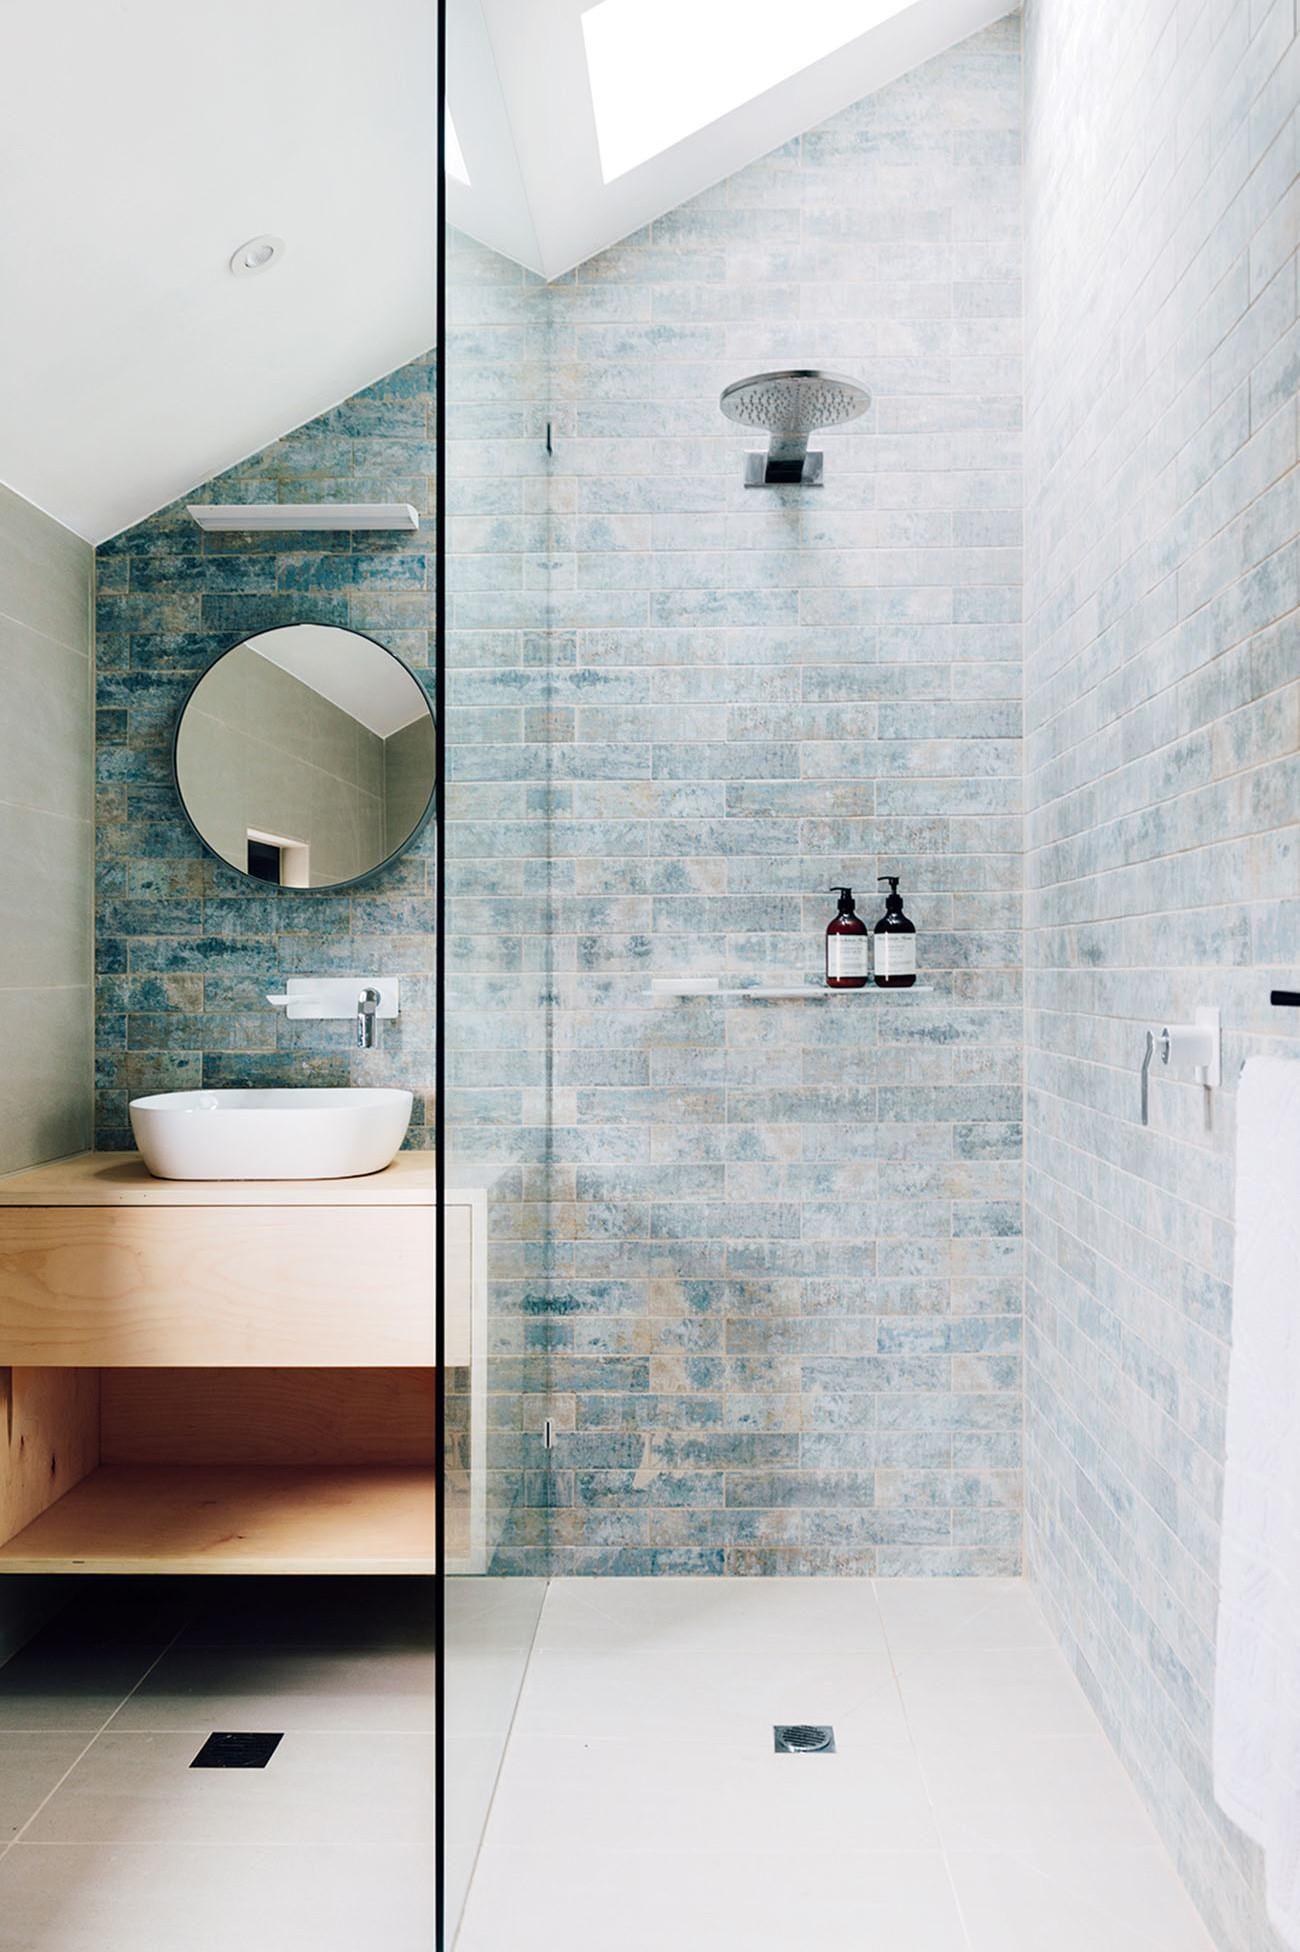 photo How to Plan a Bathroom Renovation